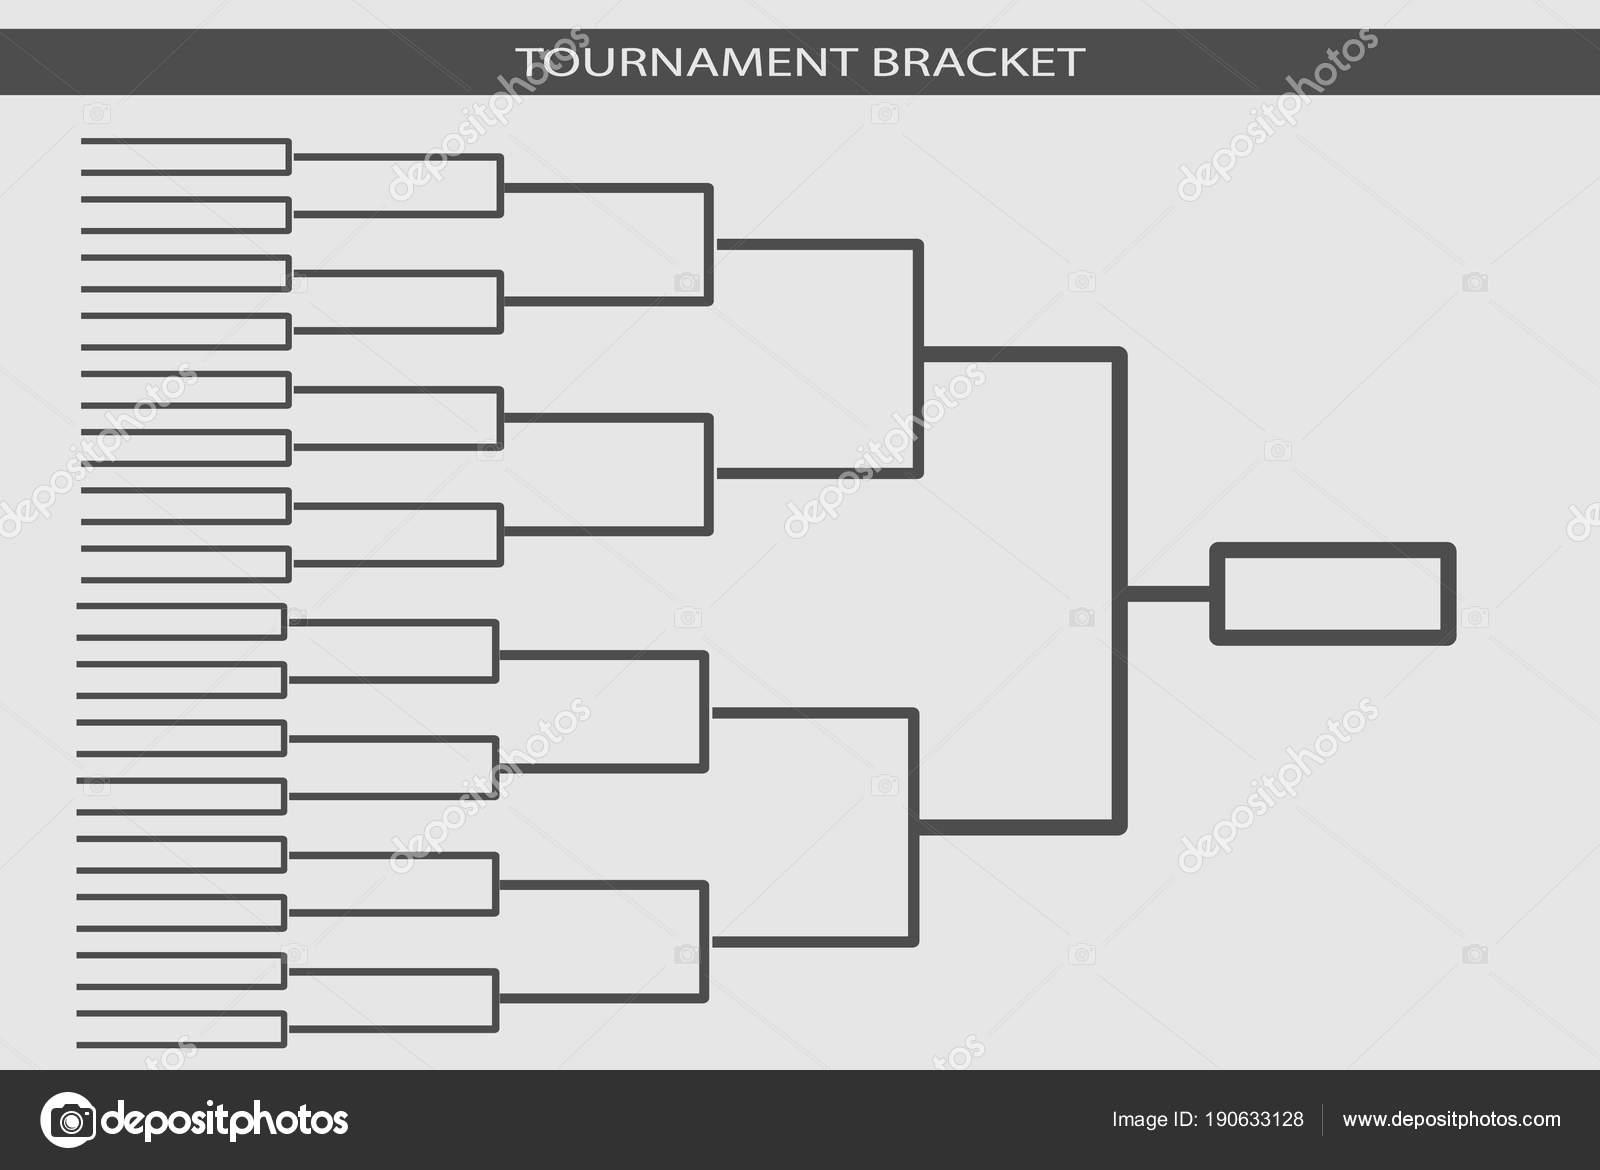 Tournament bracket vector  Championship template  — Stock Photo